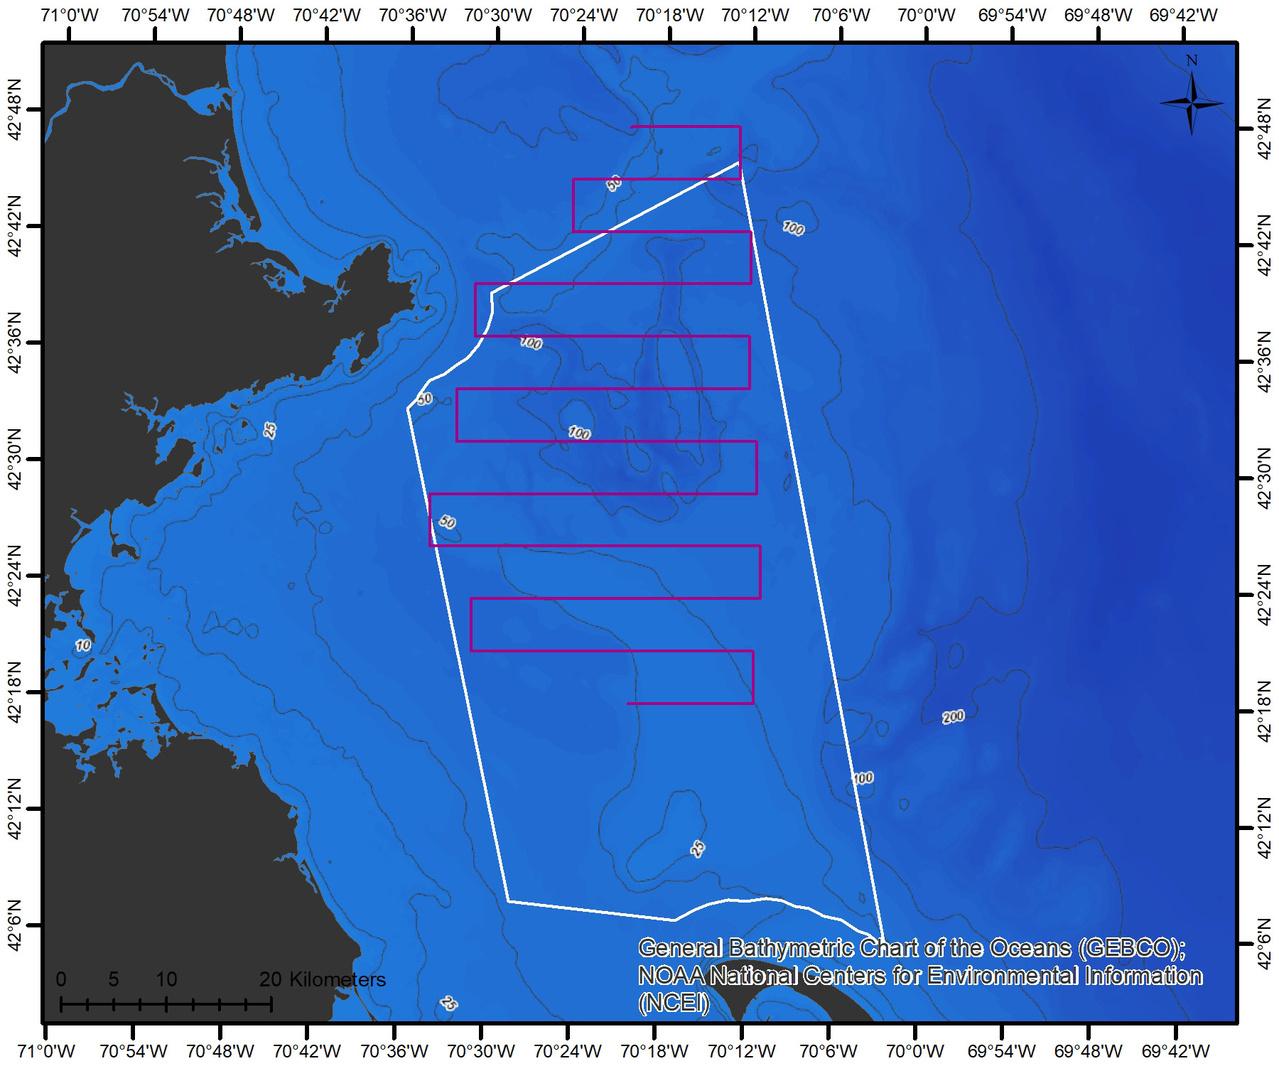 Map showing proposed glider tracks inside boundaries of  Stellwagen Bank National Marine Sanctuary off Massachusetts